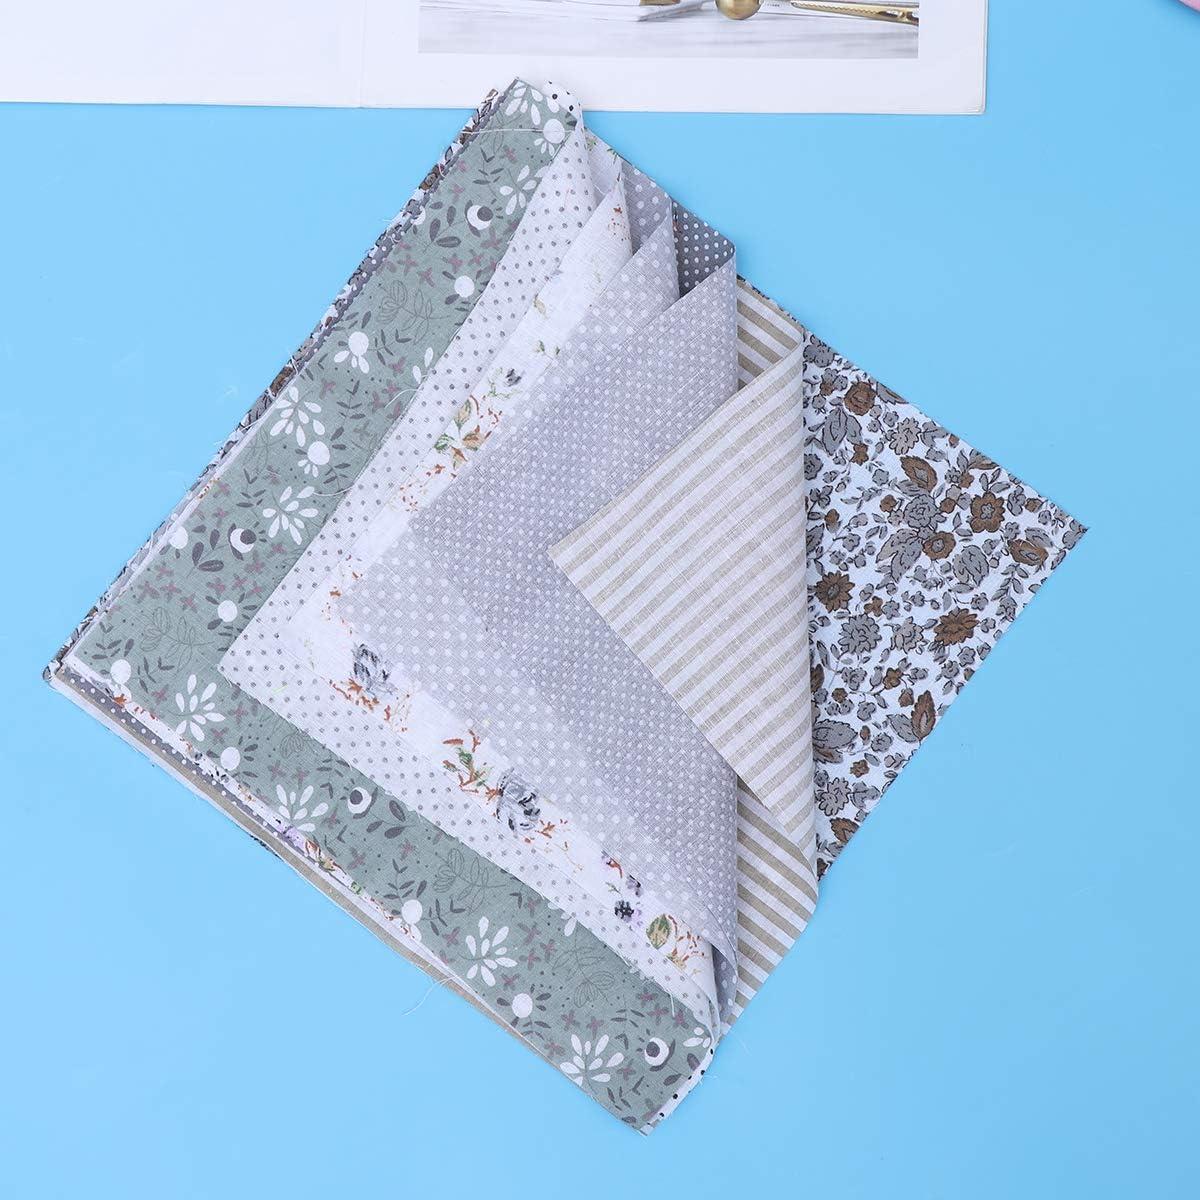 SUPVOX Cotton Fabric Bundles Precut Squares Quilting Fabric Quarter Fabric Bundle Patterns 7PCS